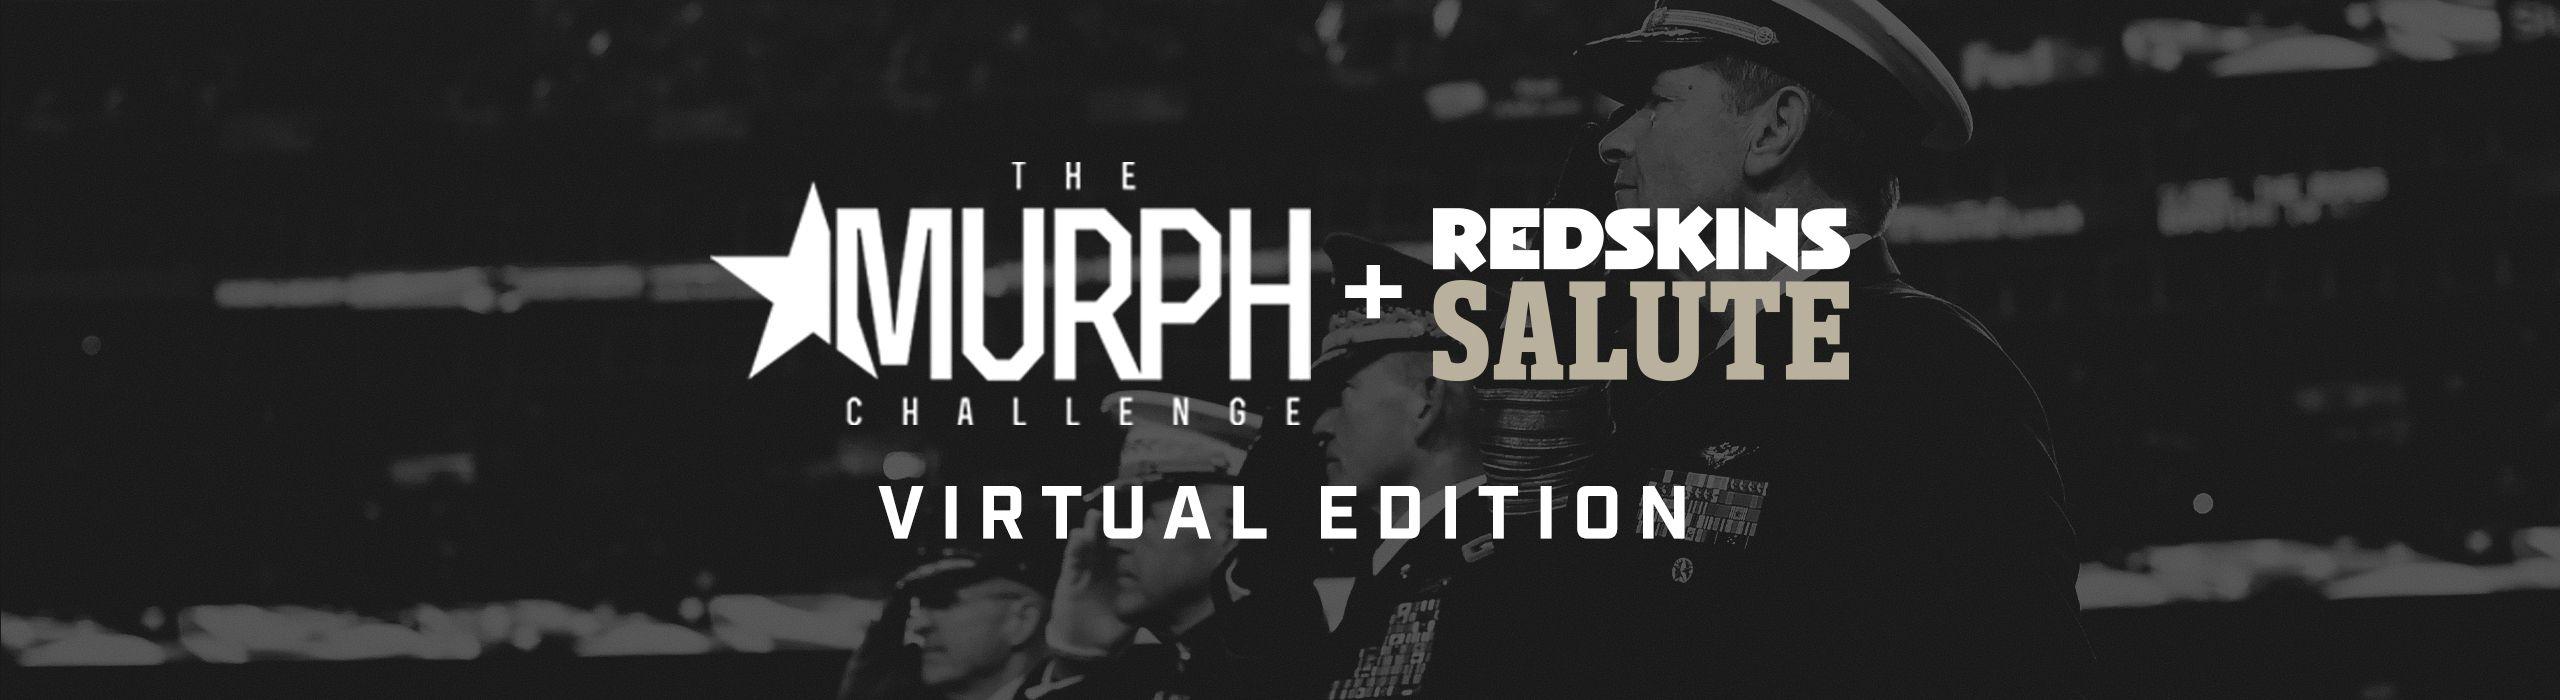 RedskinsSalute_MurphChallenge_FormstackHeader